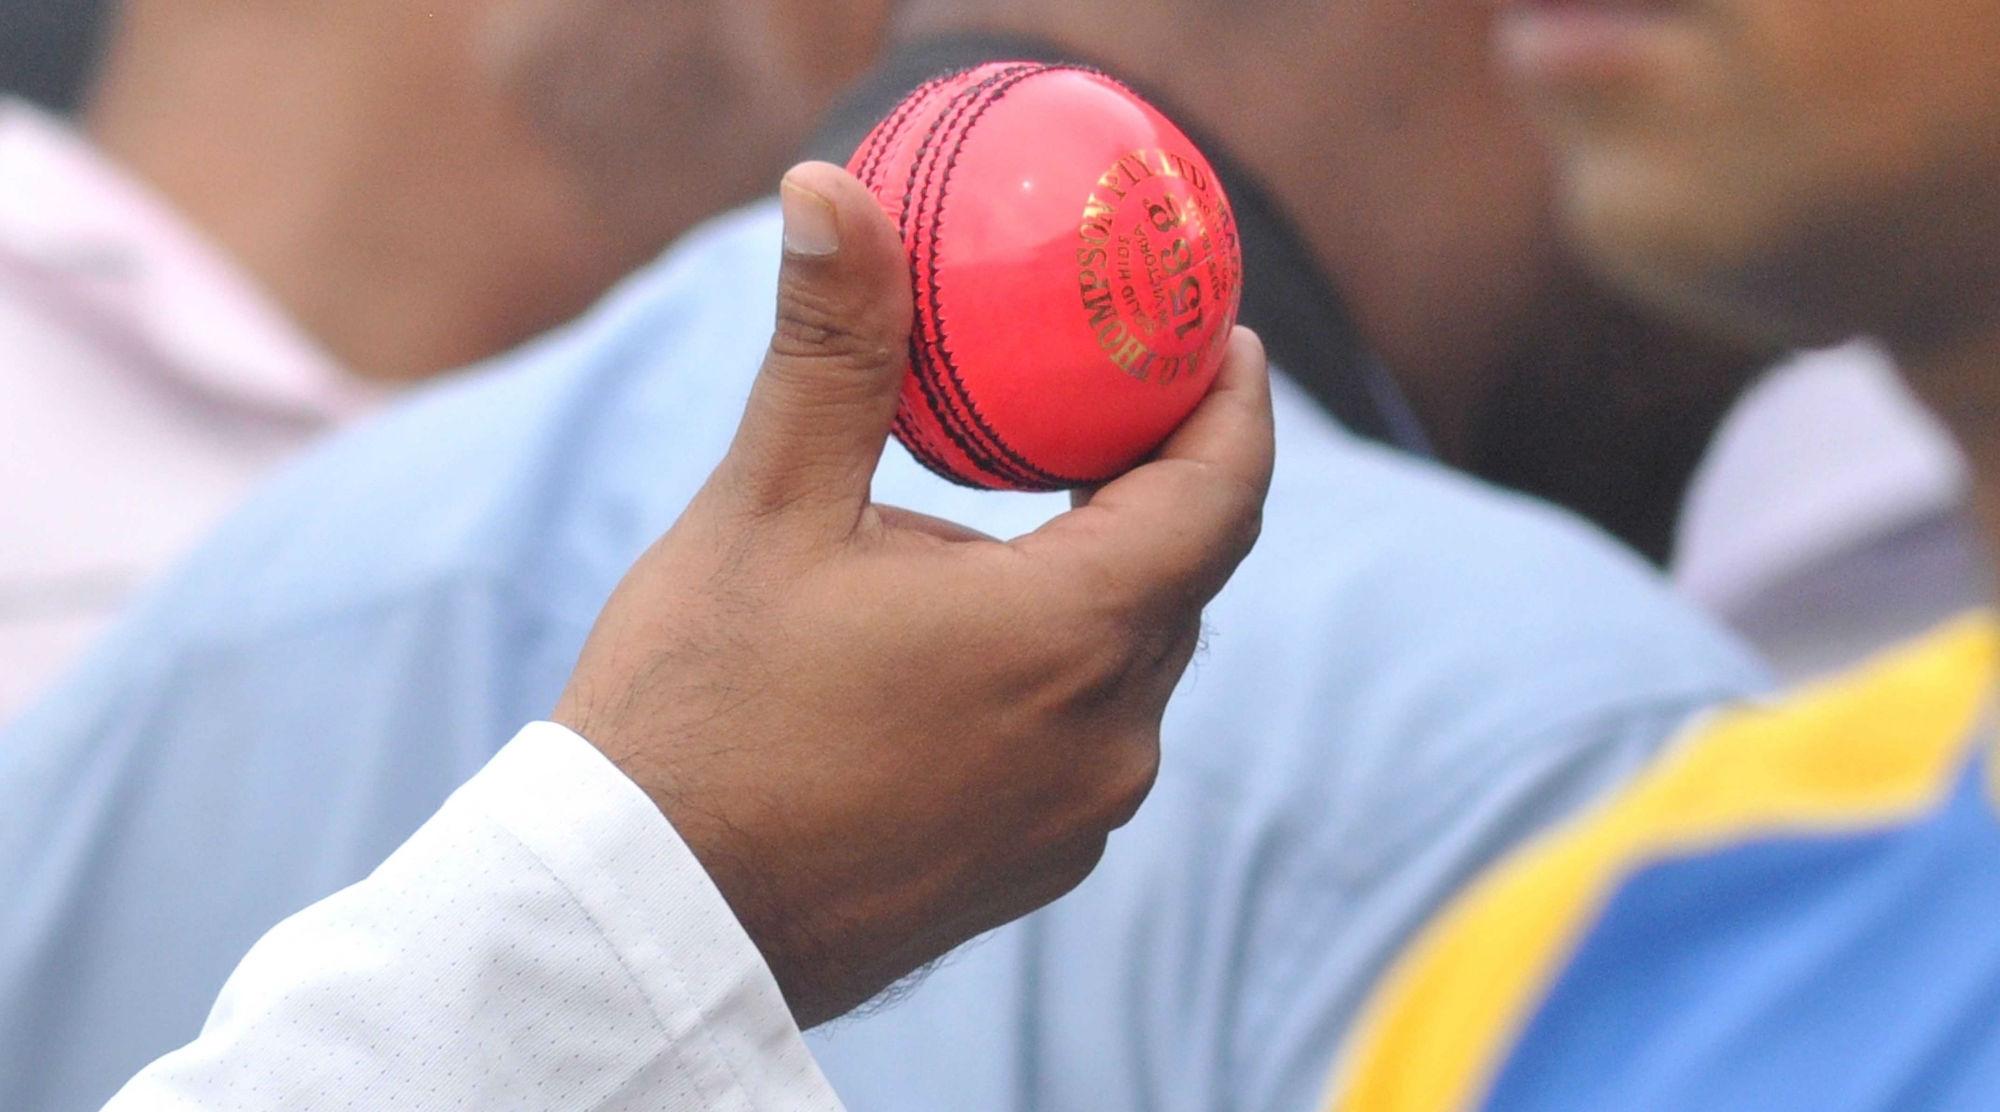 India vs Bangladesh Day-Night Test 2019: Eden Gardens Curator Sujan Mukherjee Says 'Shine Less on SG Pink Ball than Kookaburra'